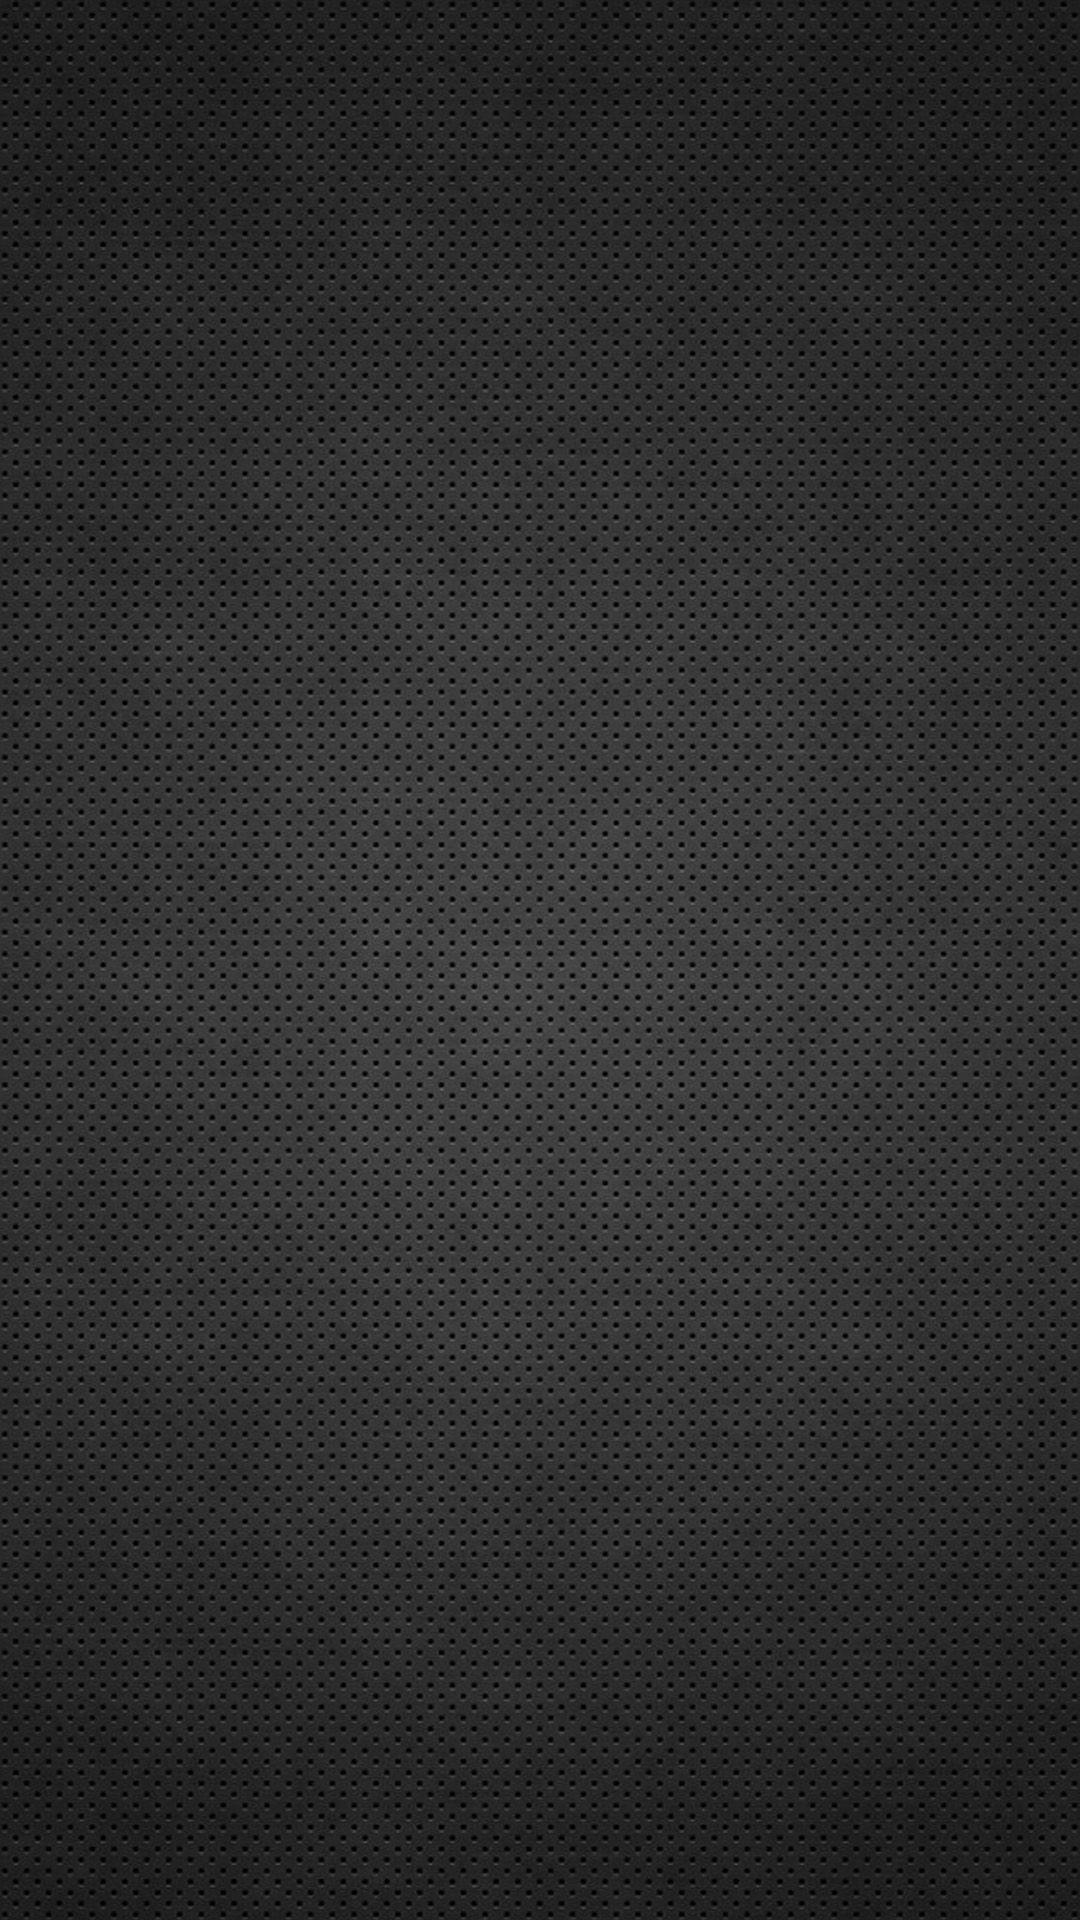 Sunset Lg G Wallpapers Hd Lg G Wallpapers Lg Wallpapers Iphone Wallpaper Black Wallpaper Iphone 6 Wallpaper